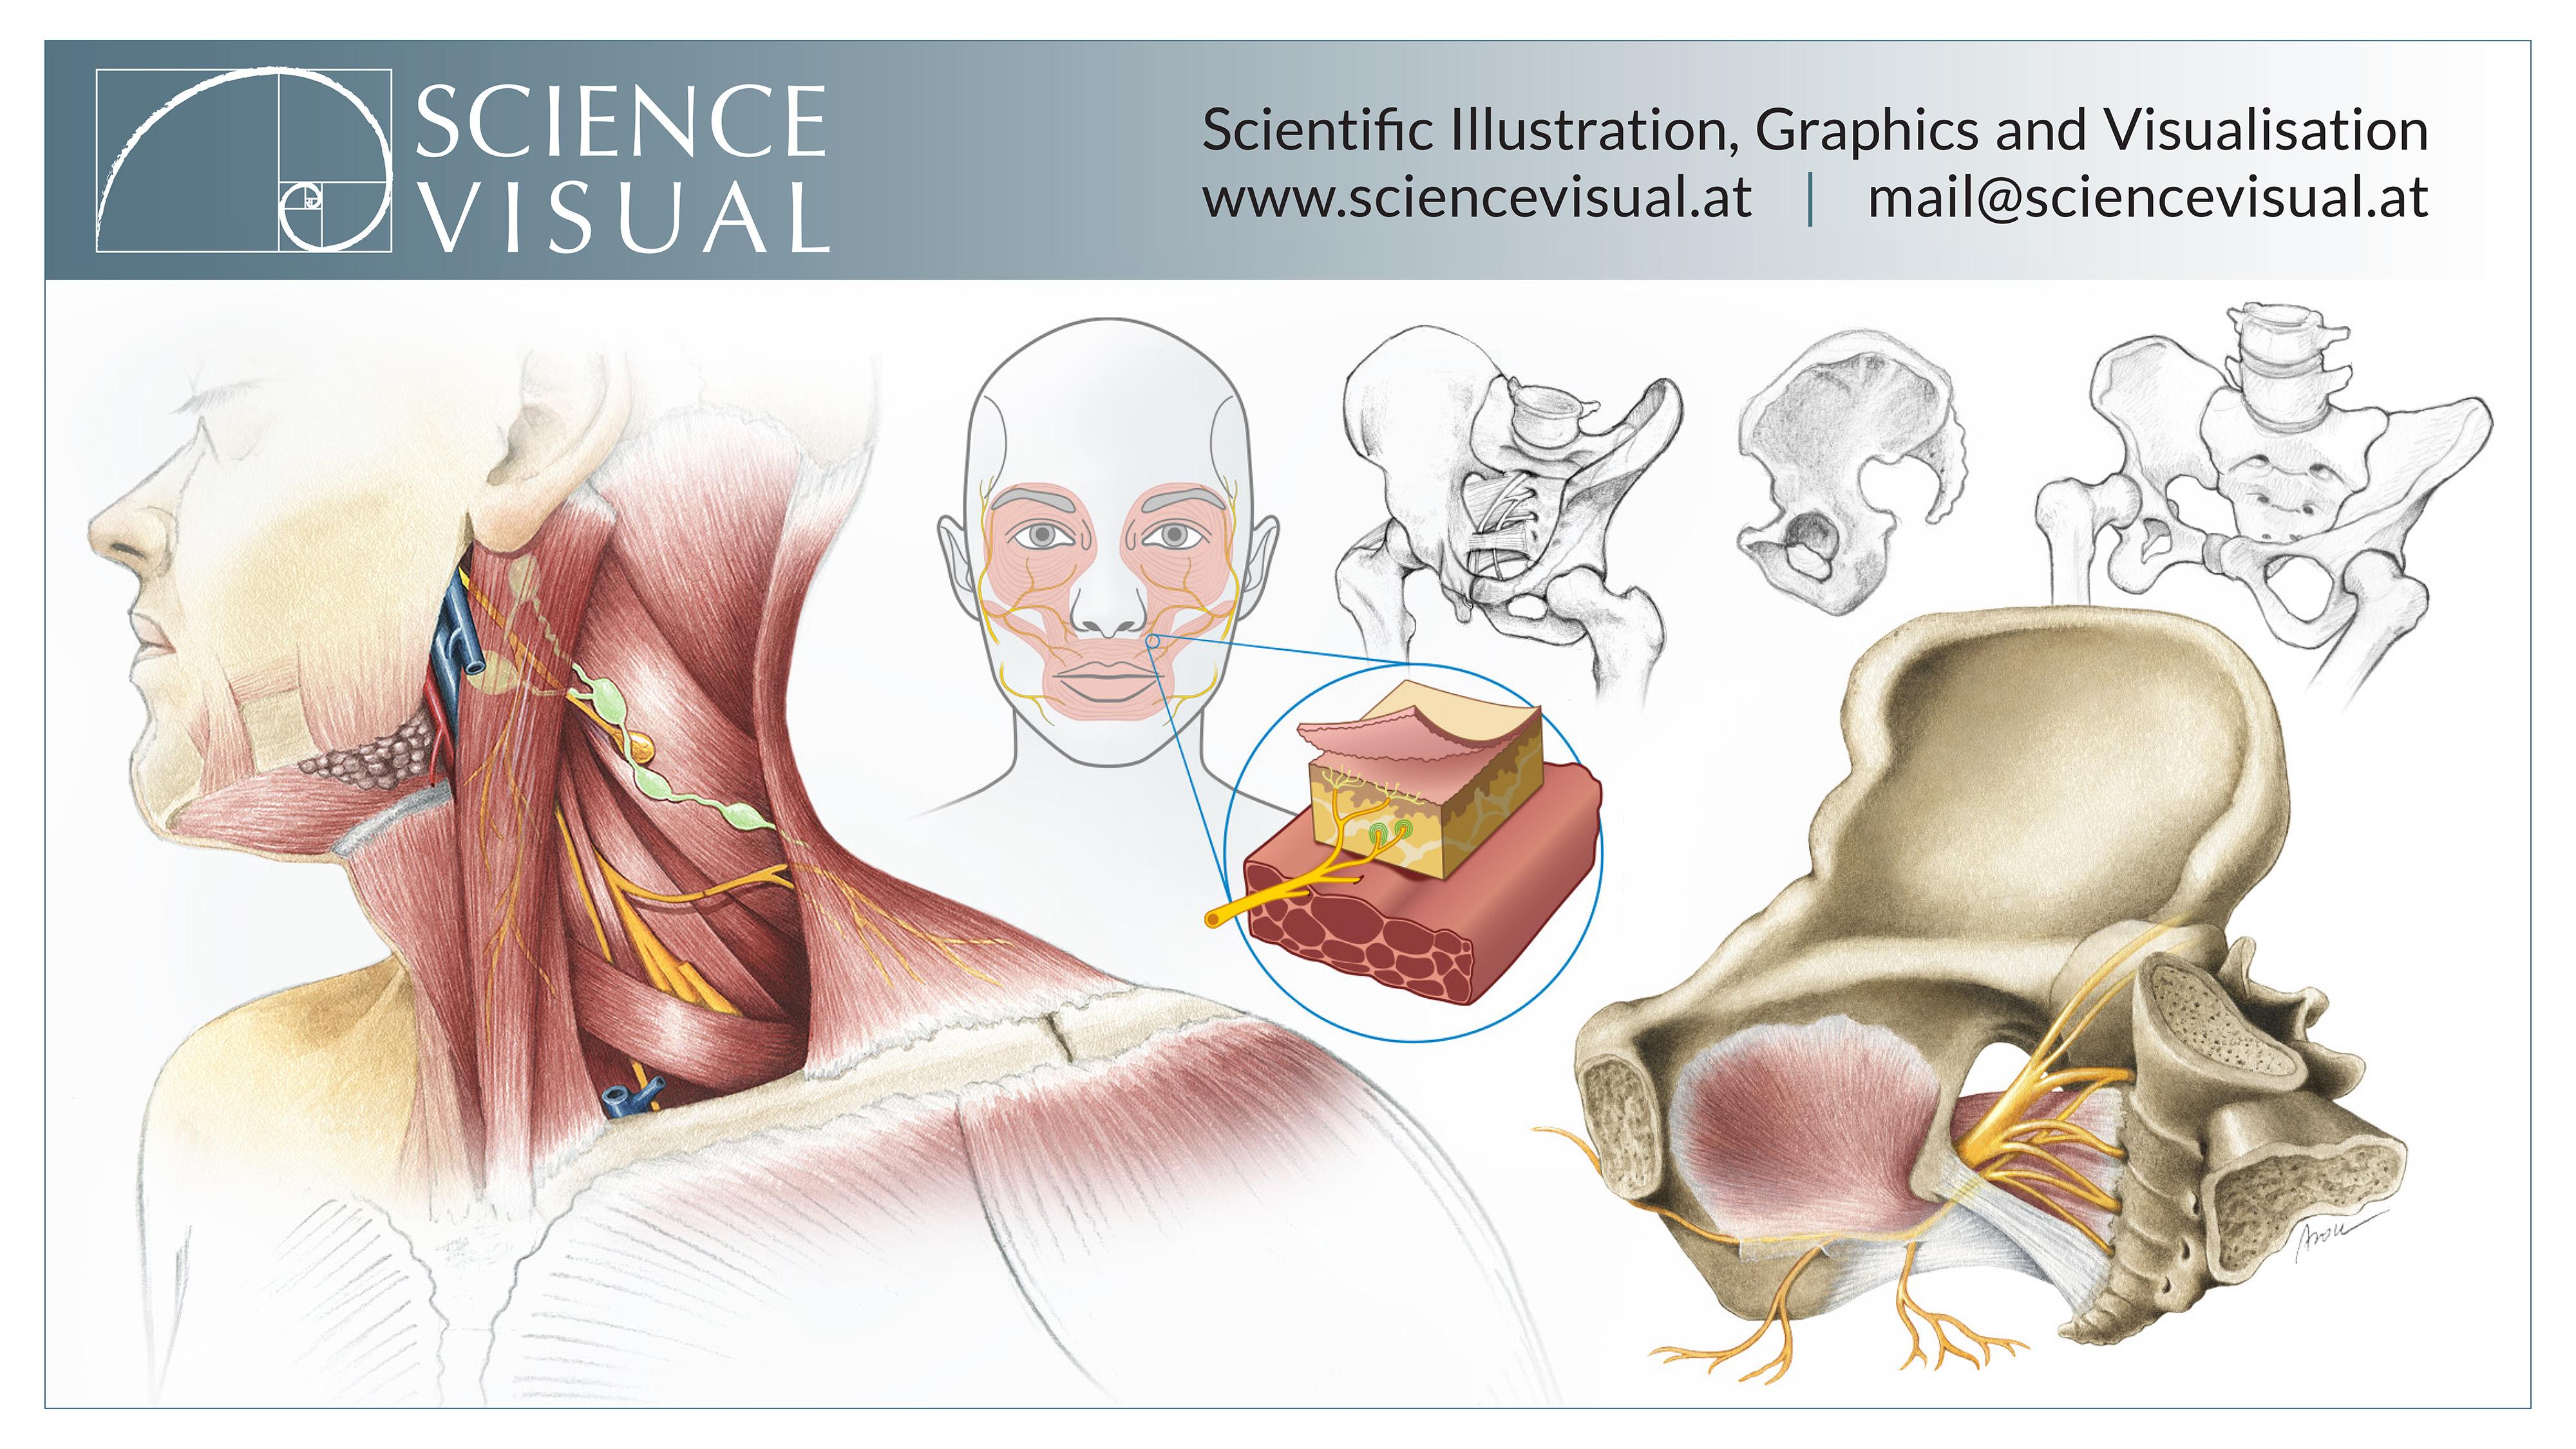 Science Visual - Scientific Illustrations by Aron Cserveny